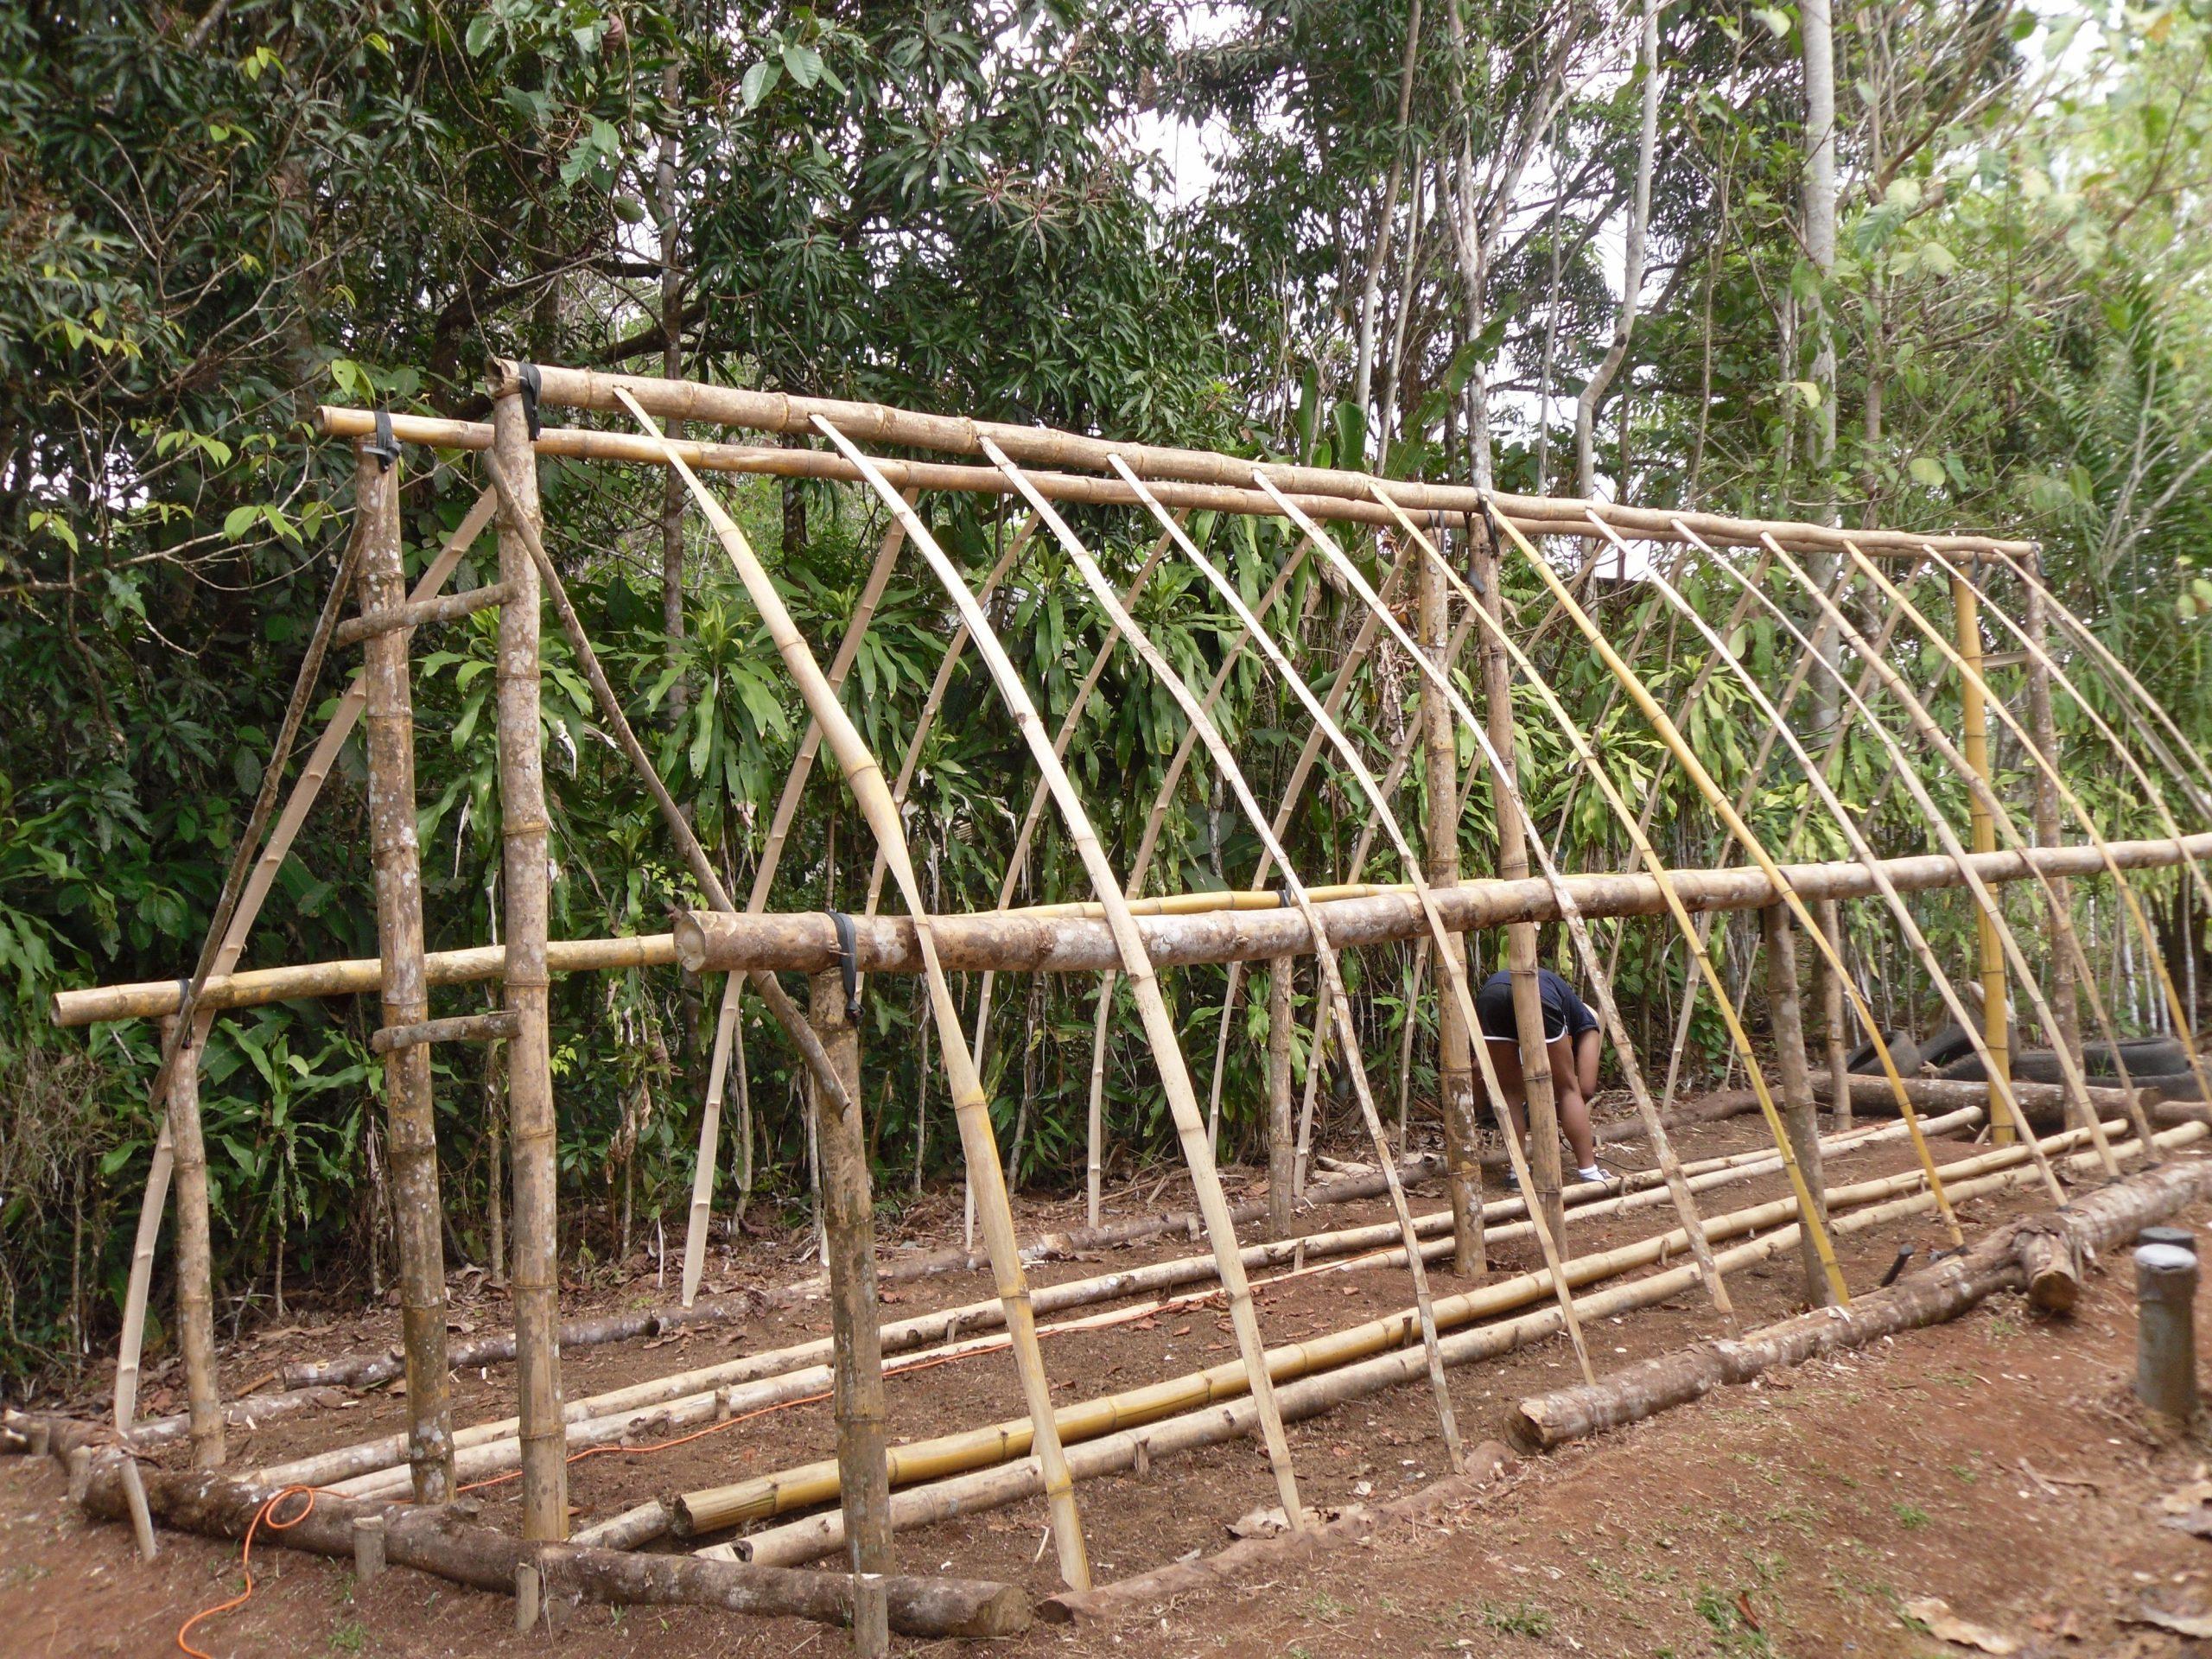 Https://costaricaprogram.files.wordpress/2012/05 ... pour Abri Jardin Bambou